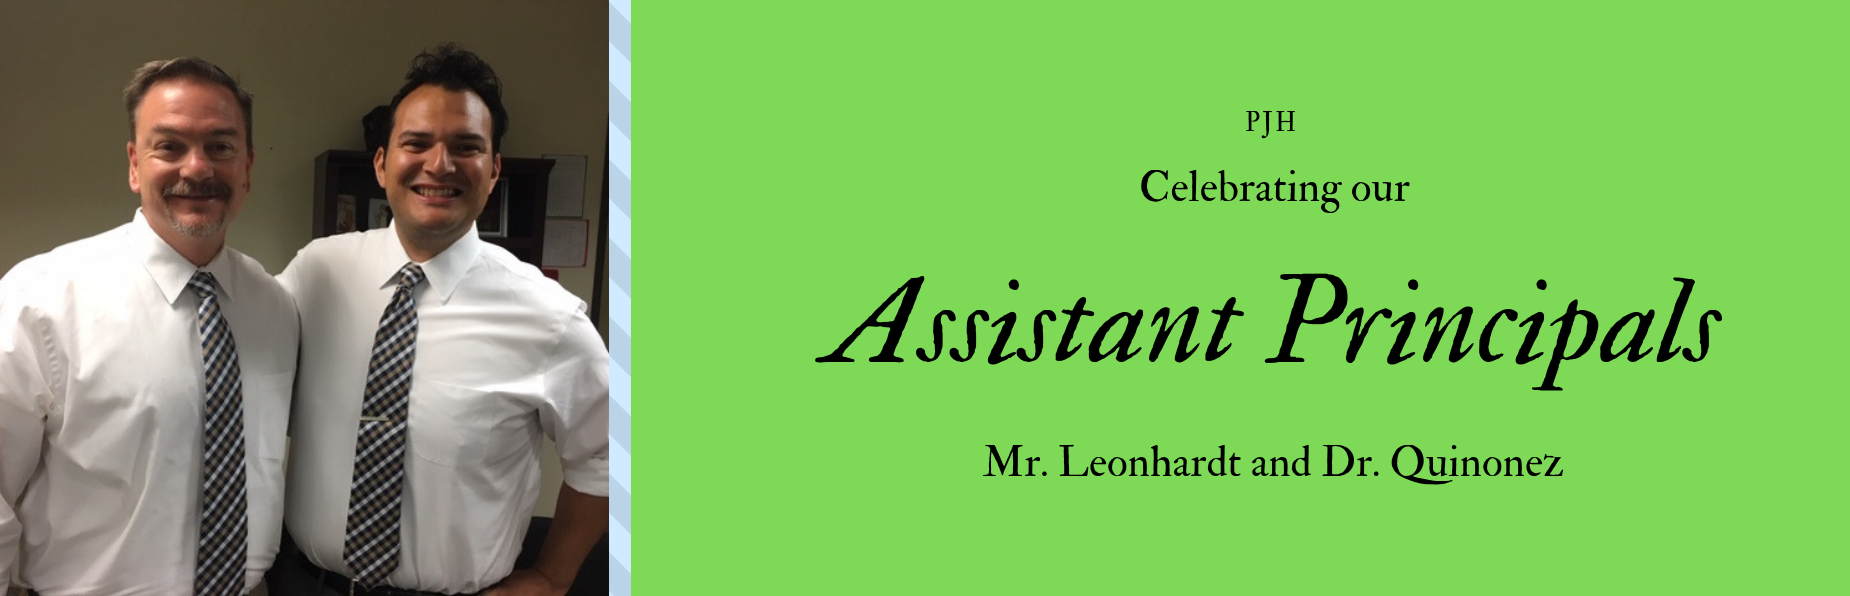 Celebrating our Assistant Principals